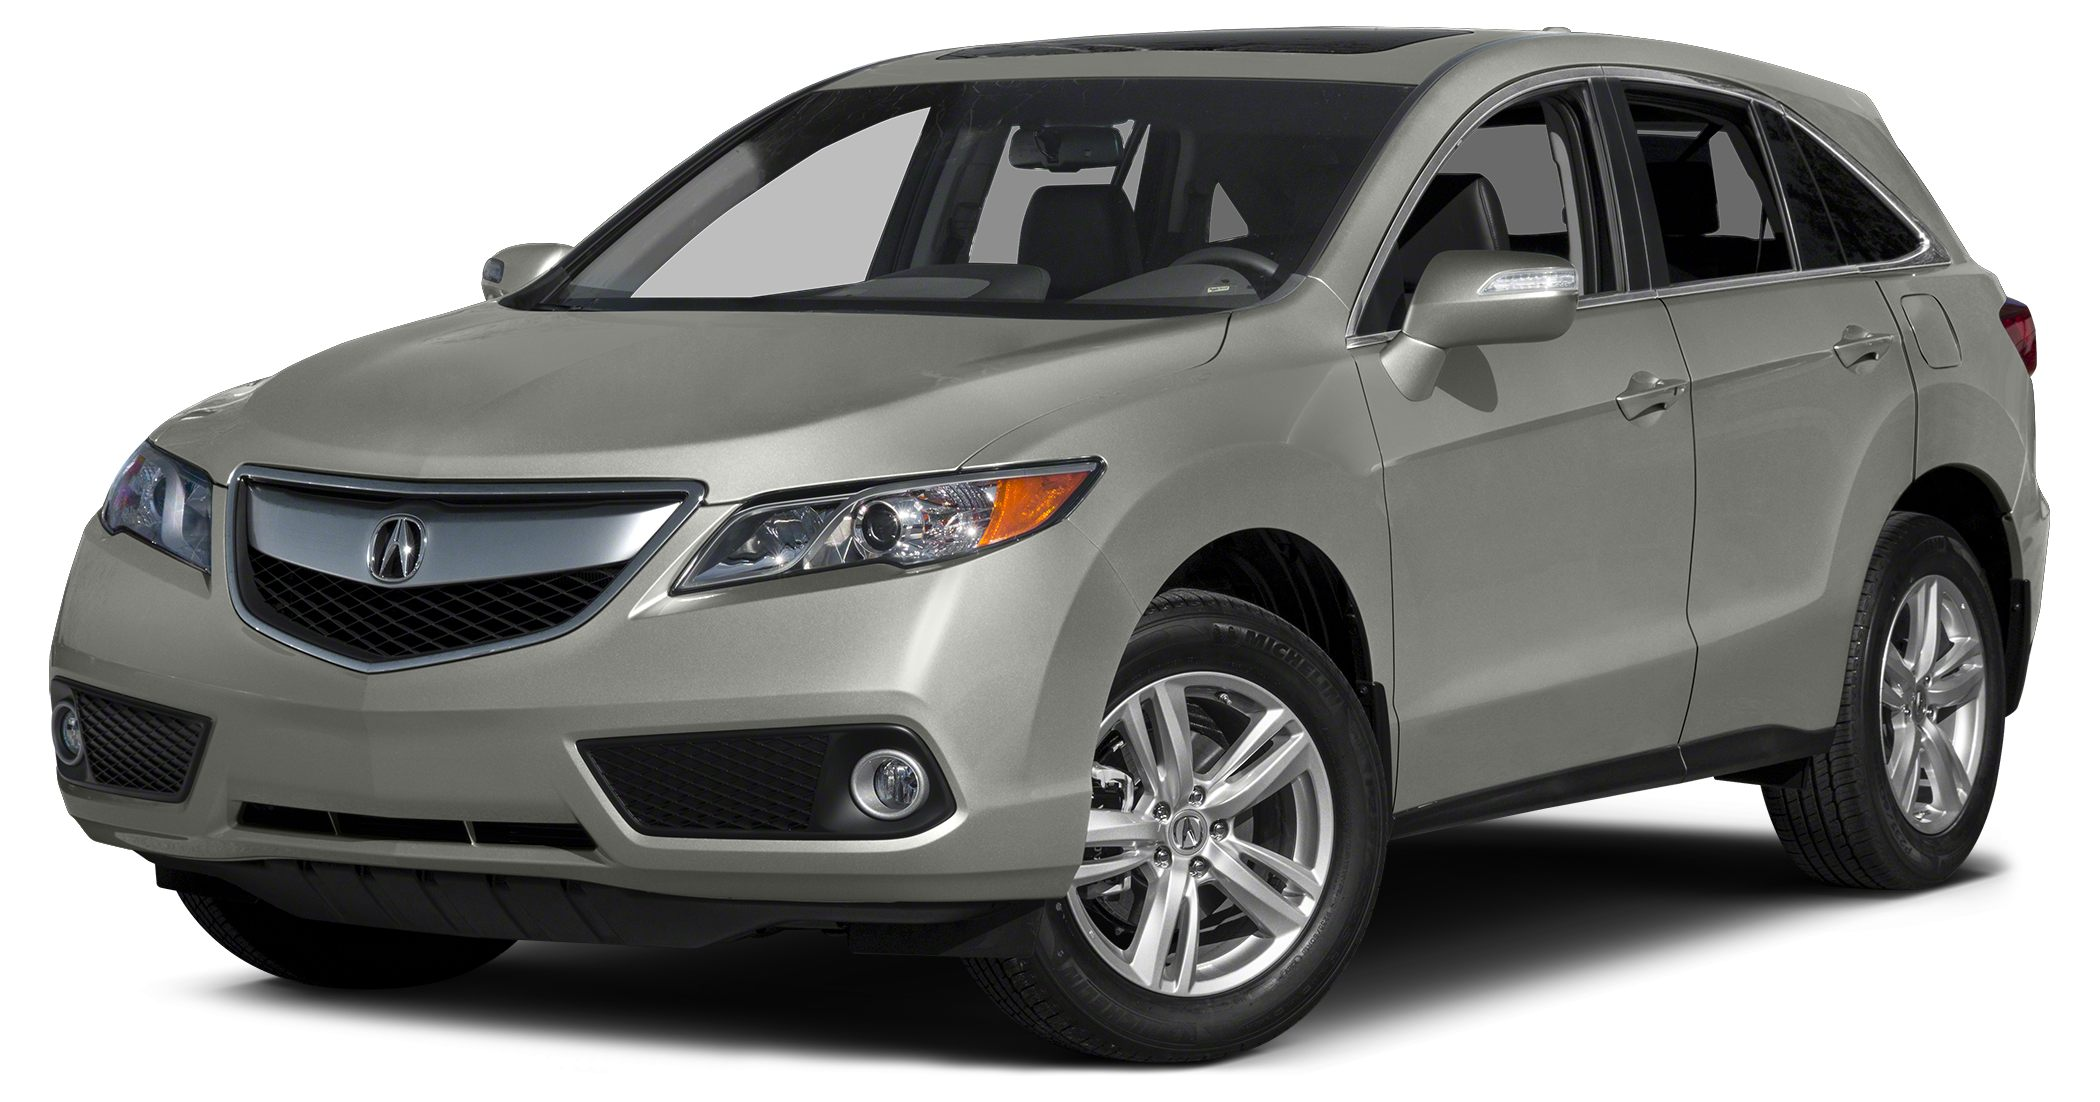 2015 Acura RDX Technology Nav The Regal Honda Advantage Type your sentence here Imagine yoursel